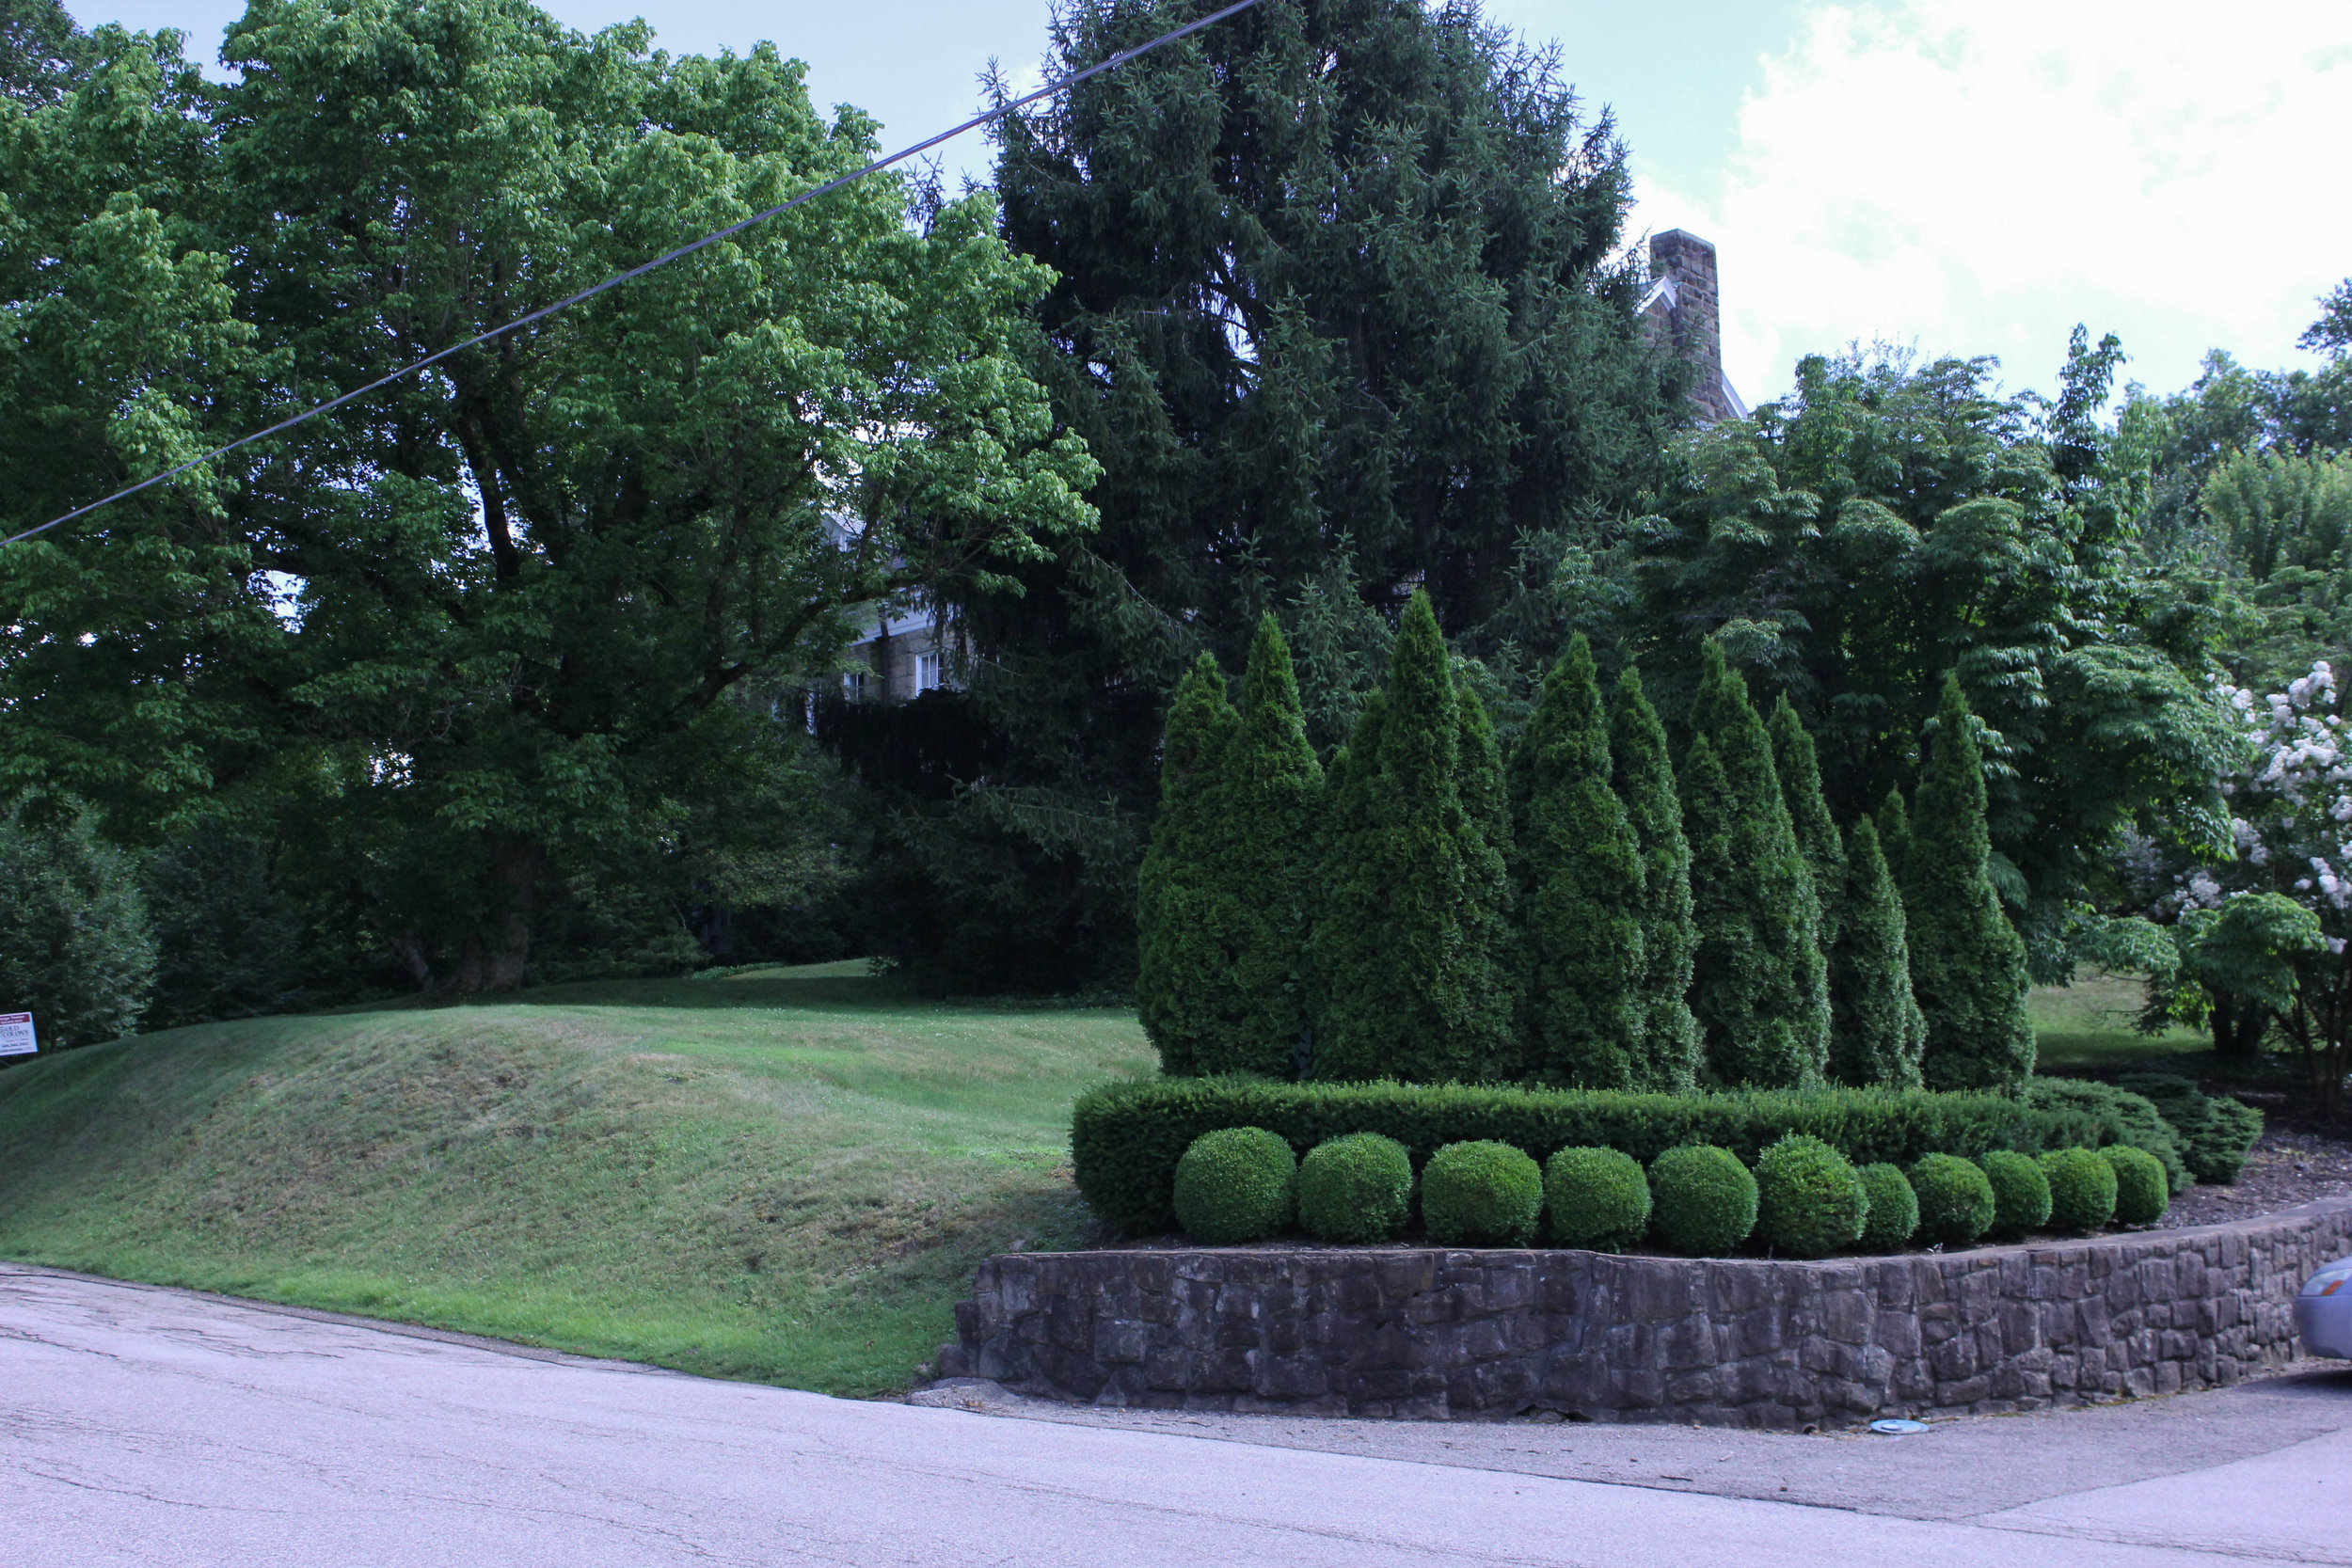 trees-5032.jpg